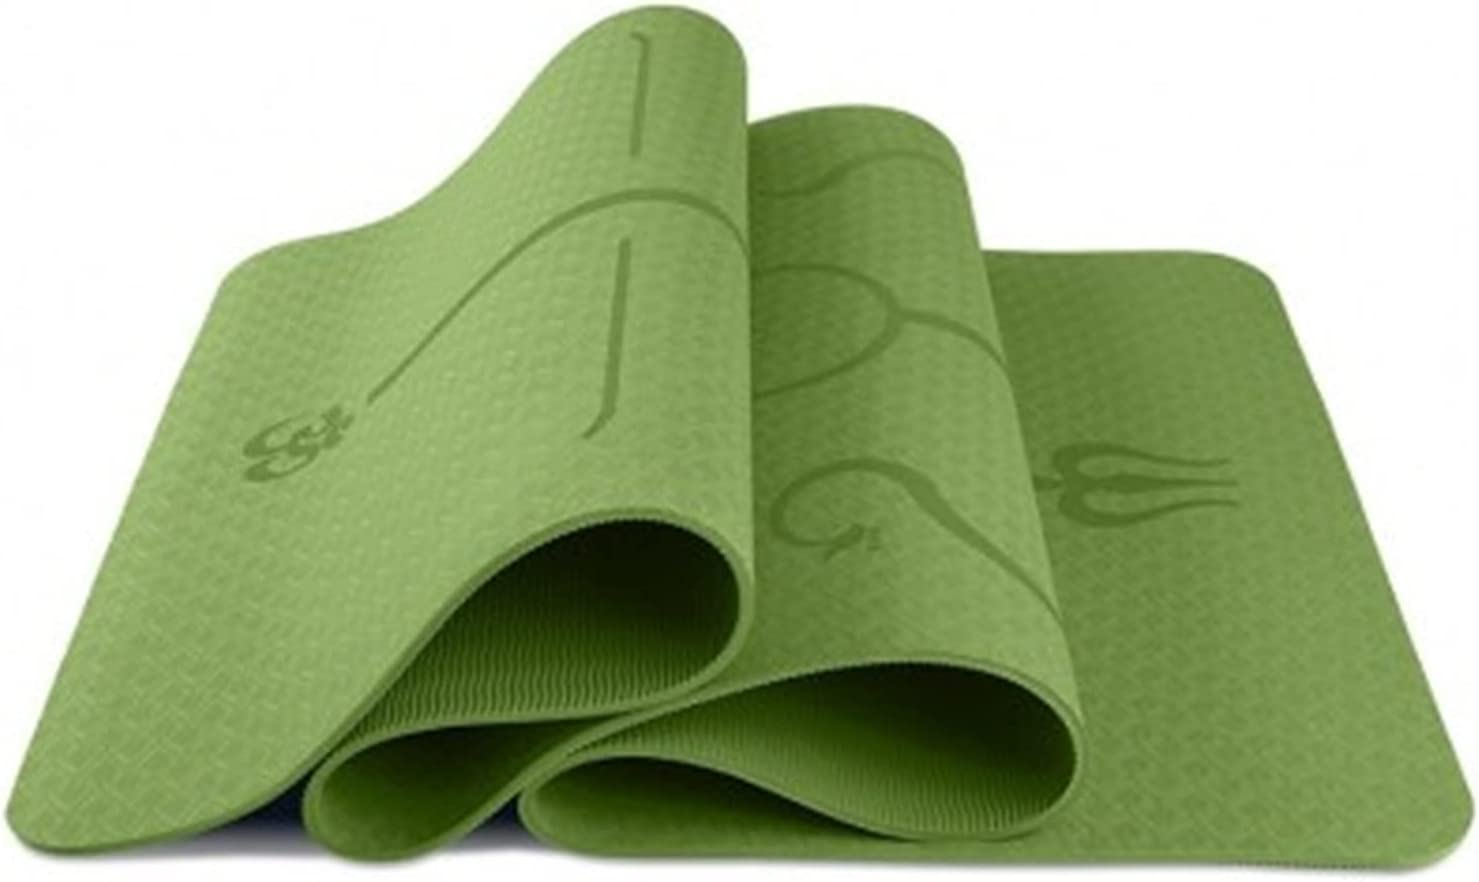 AAUU TPE Non-Slip Over item handling Yoga Max 84% OFF Mat Beginner Fitness 6mm Sports